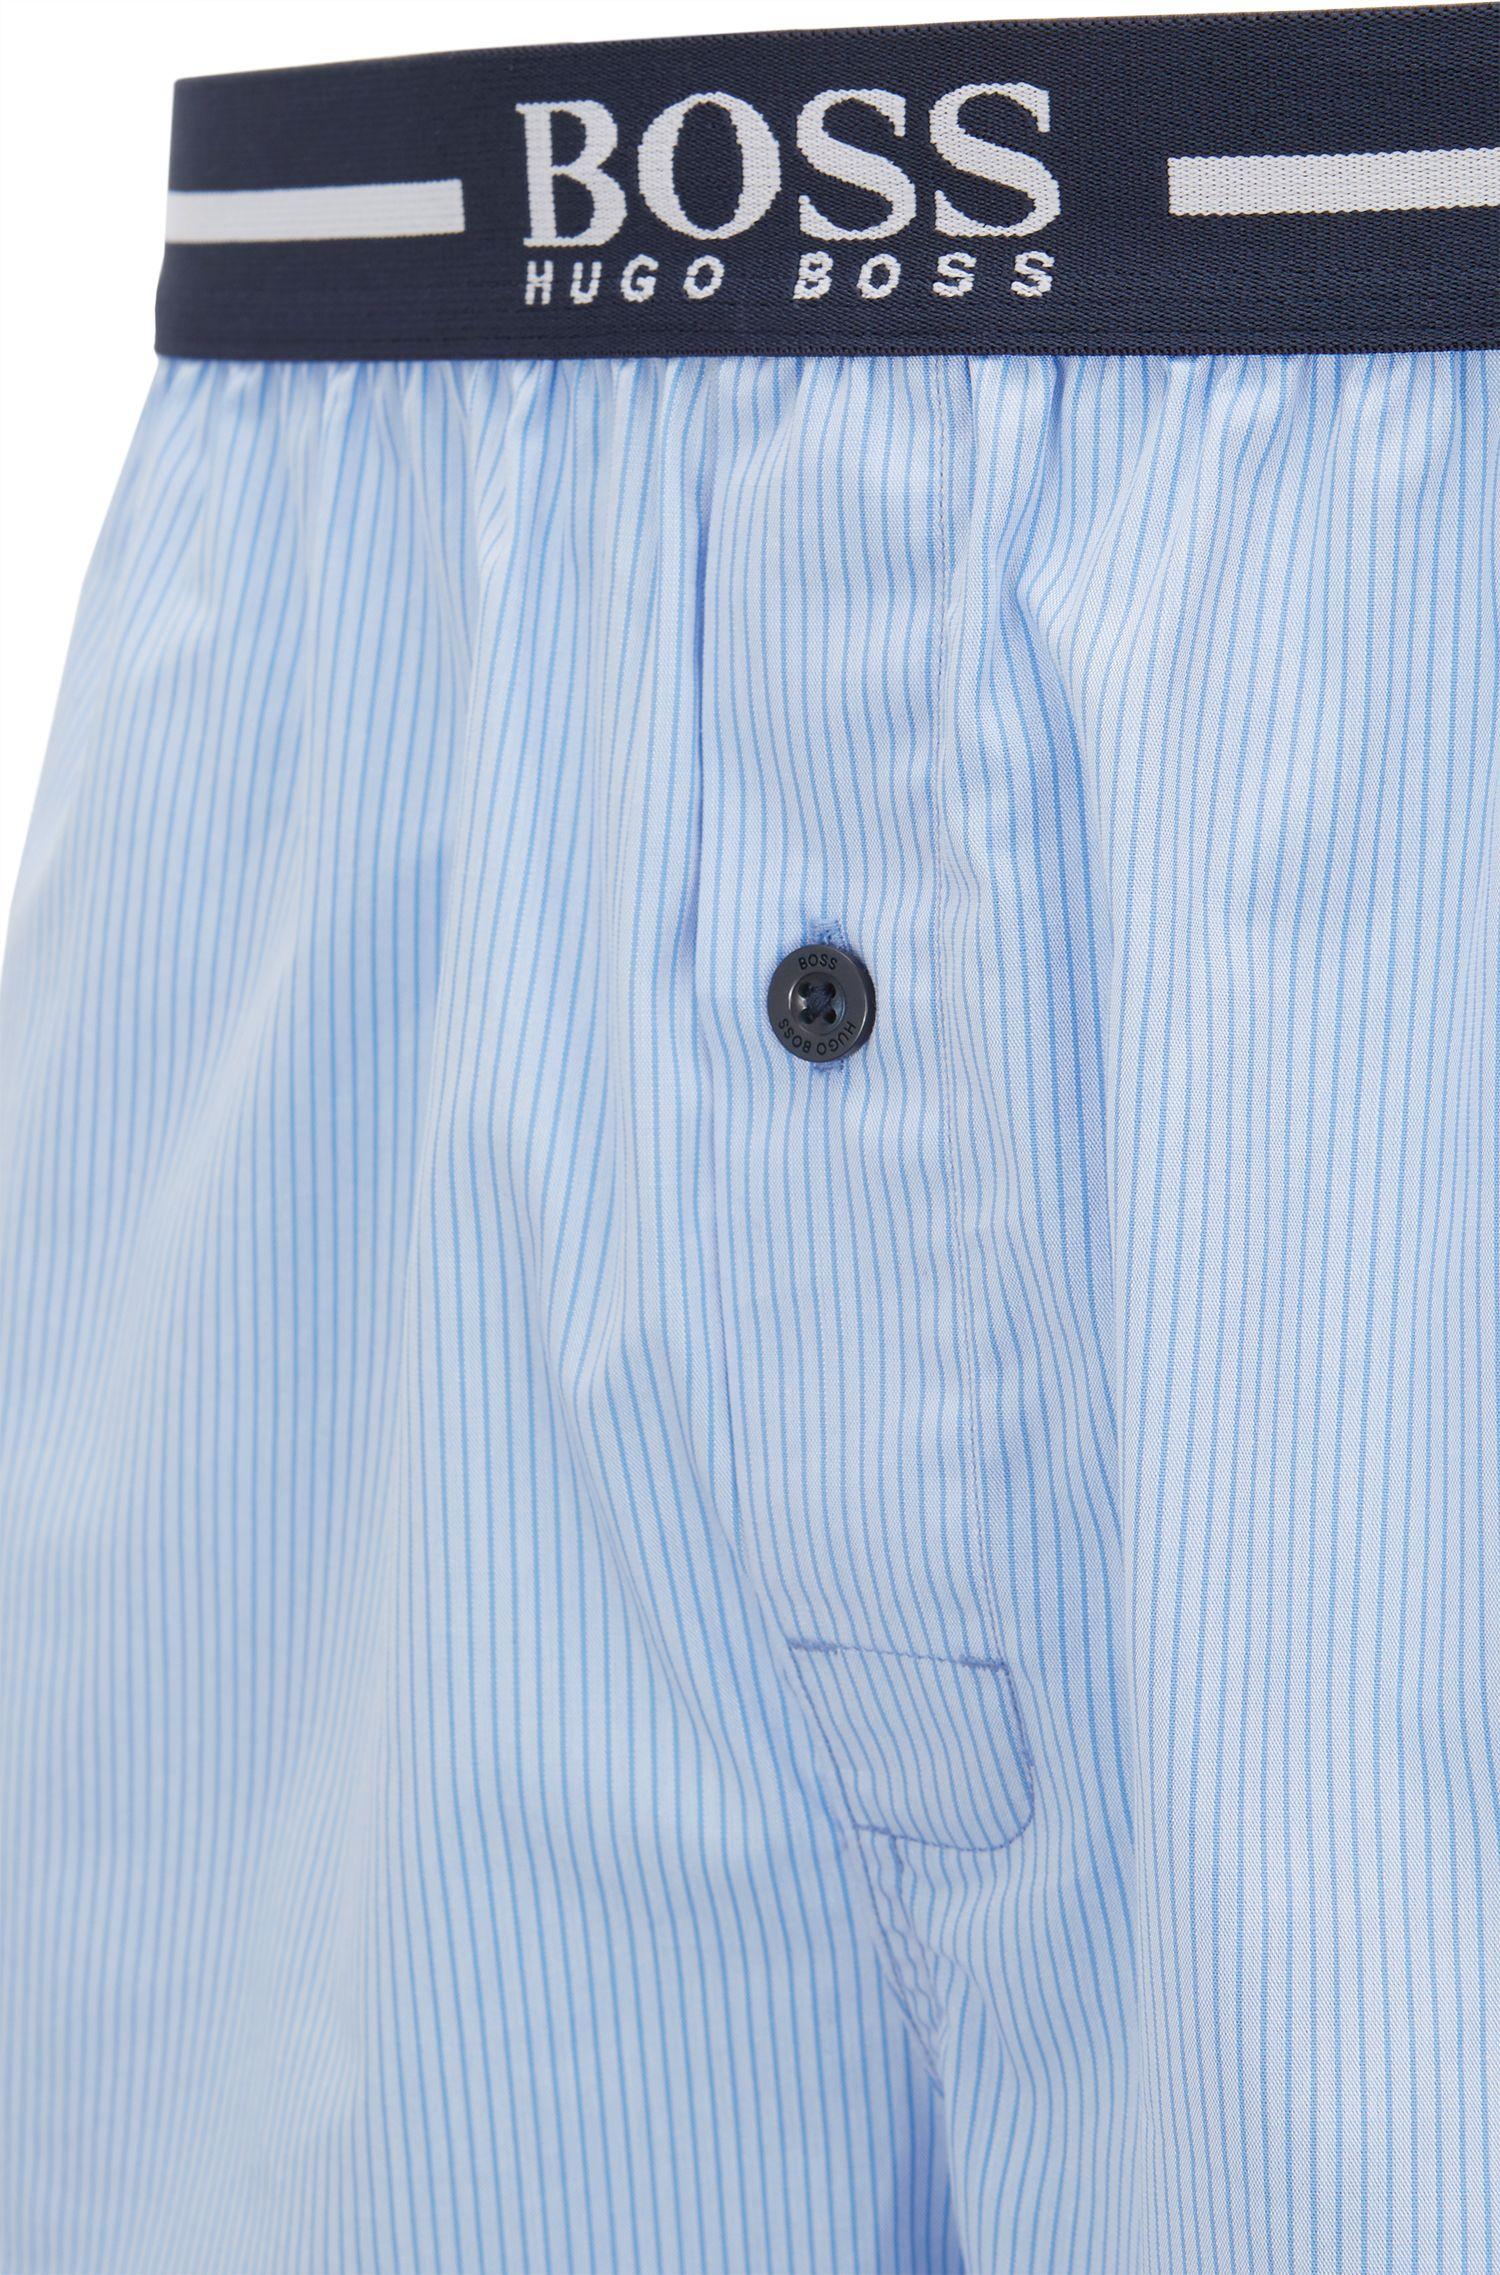 Pyjama-Shorts aus Baumwoll-Popeline im Zweier-Pack, Hellblau